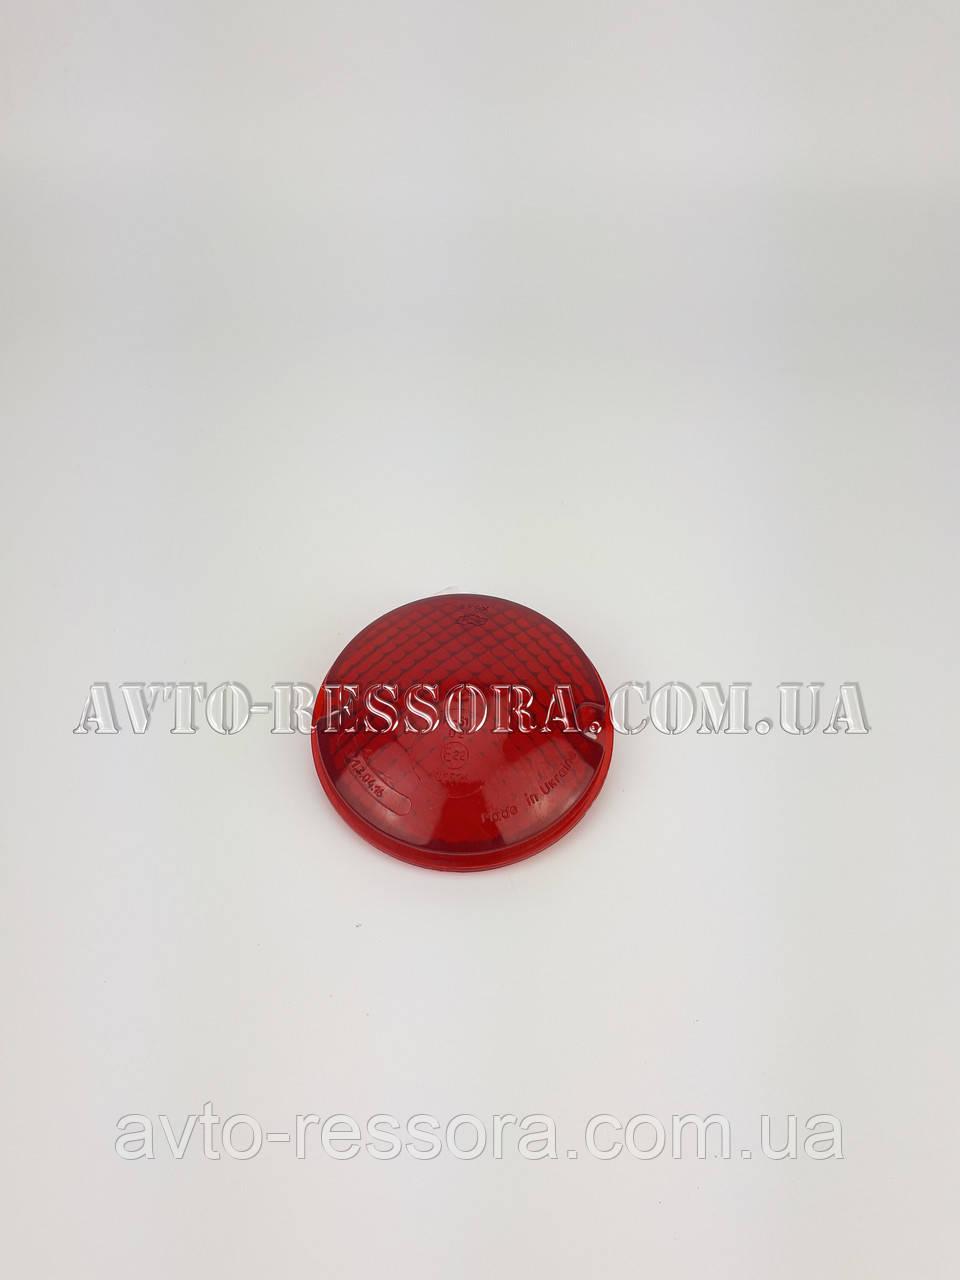 Стекло заднего фонаря габарита, стопа Богдан А-092, I-VAN (красное) пр-во Украина